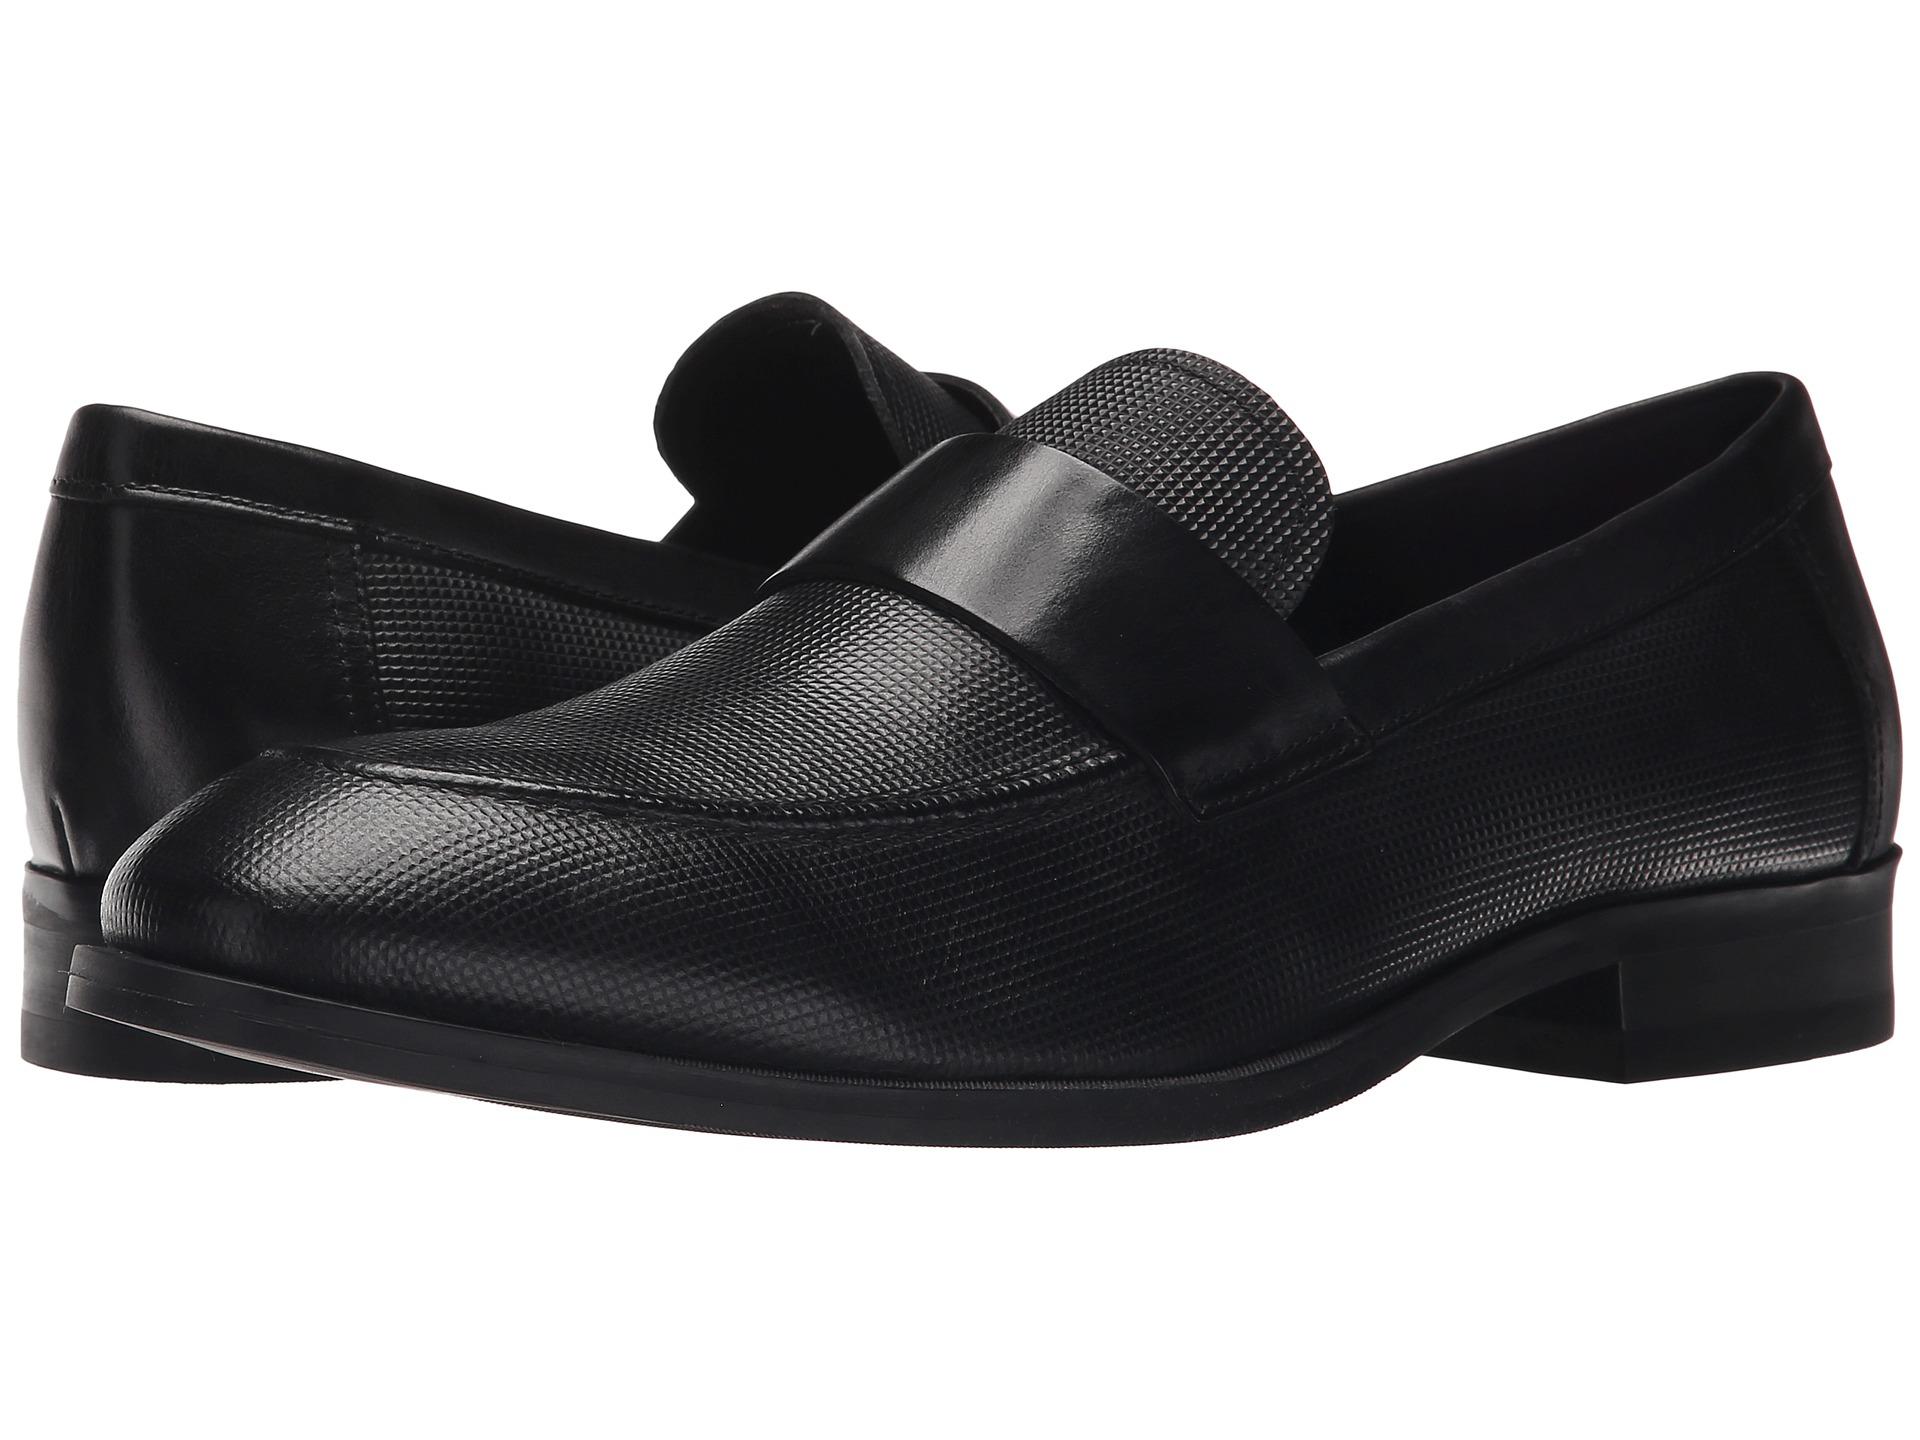 7b07f59ab0cc6 Calvin Klein Sergio in Black for Men - Lyst